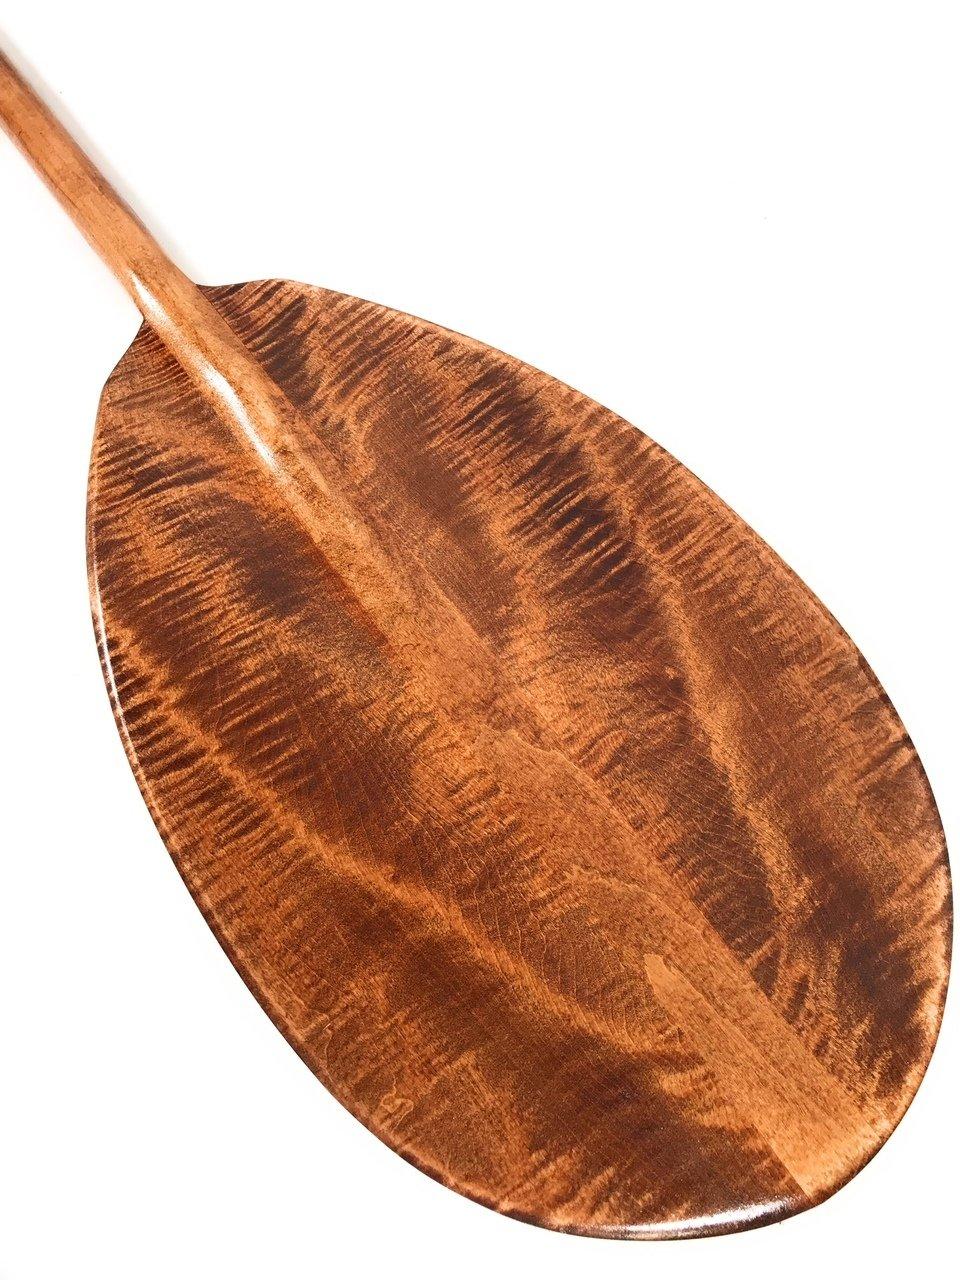 ''Comet Entry'' Decorative Paddle 50'' w/ T Handle - Curly Maple | #koa6080